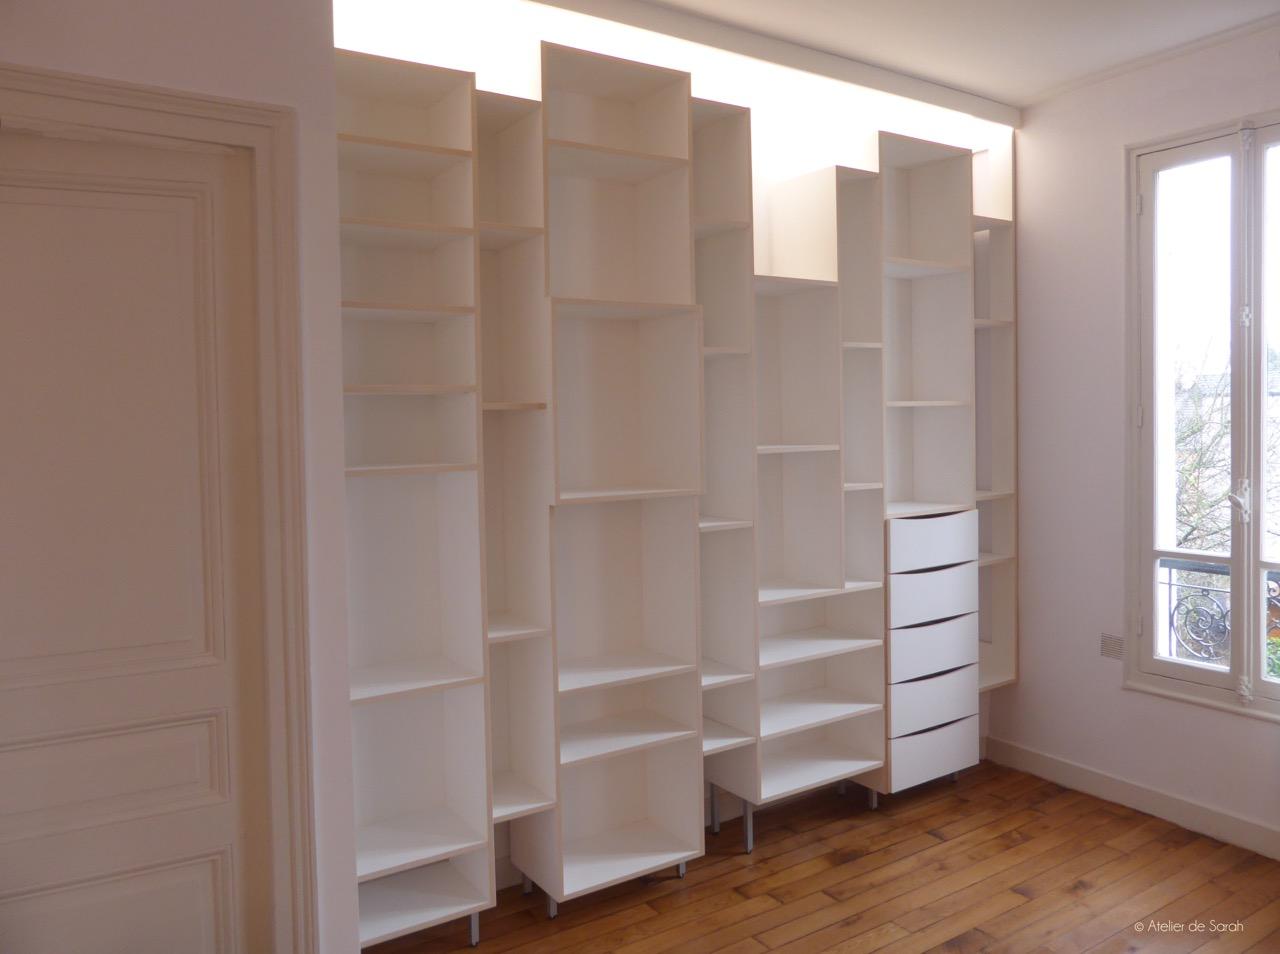 biblioth que espace de rangement i silhouette skyline atelier de sarah. Black Bedroom Furniture Sets. Home Design Ideas